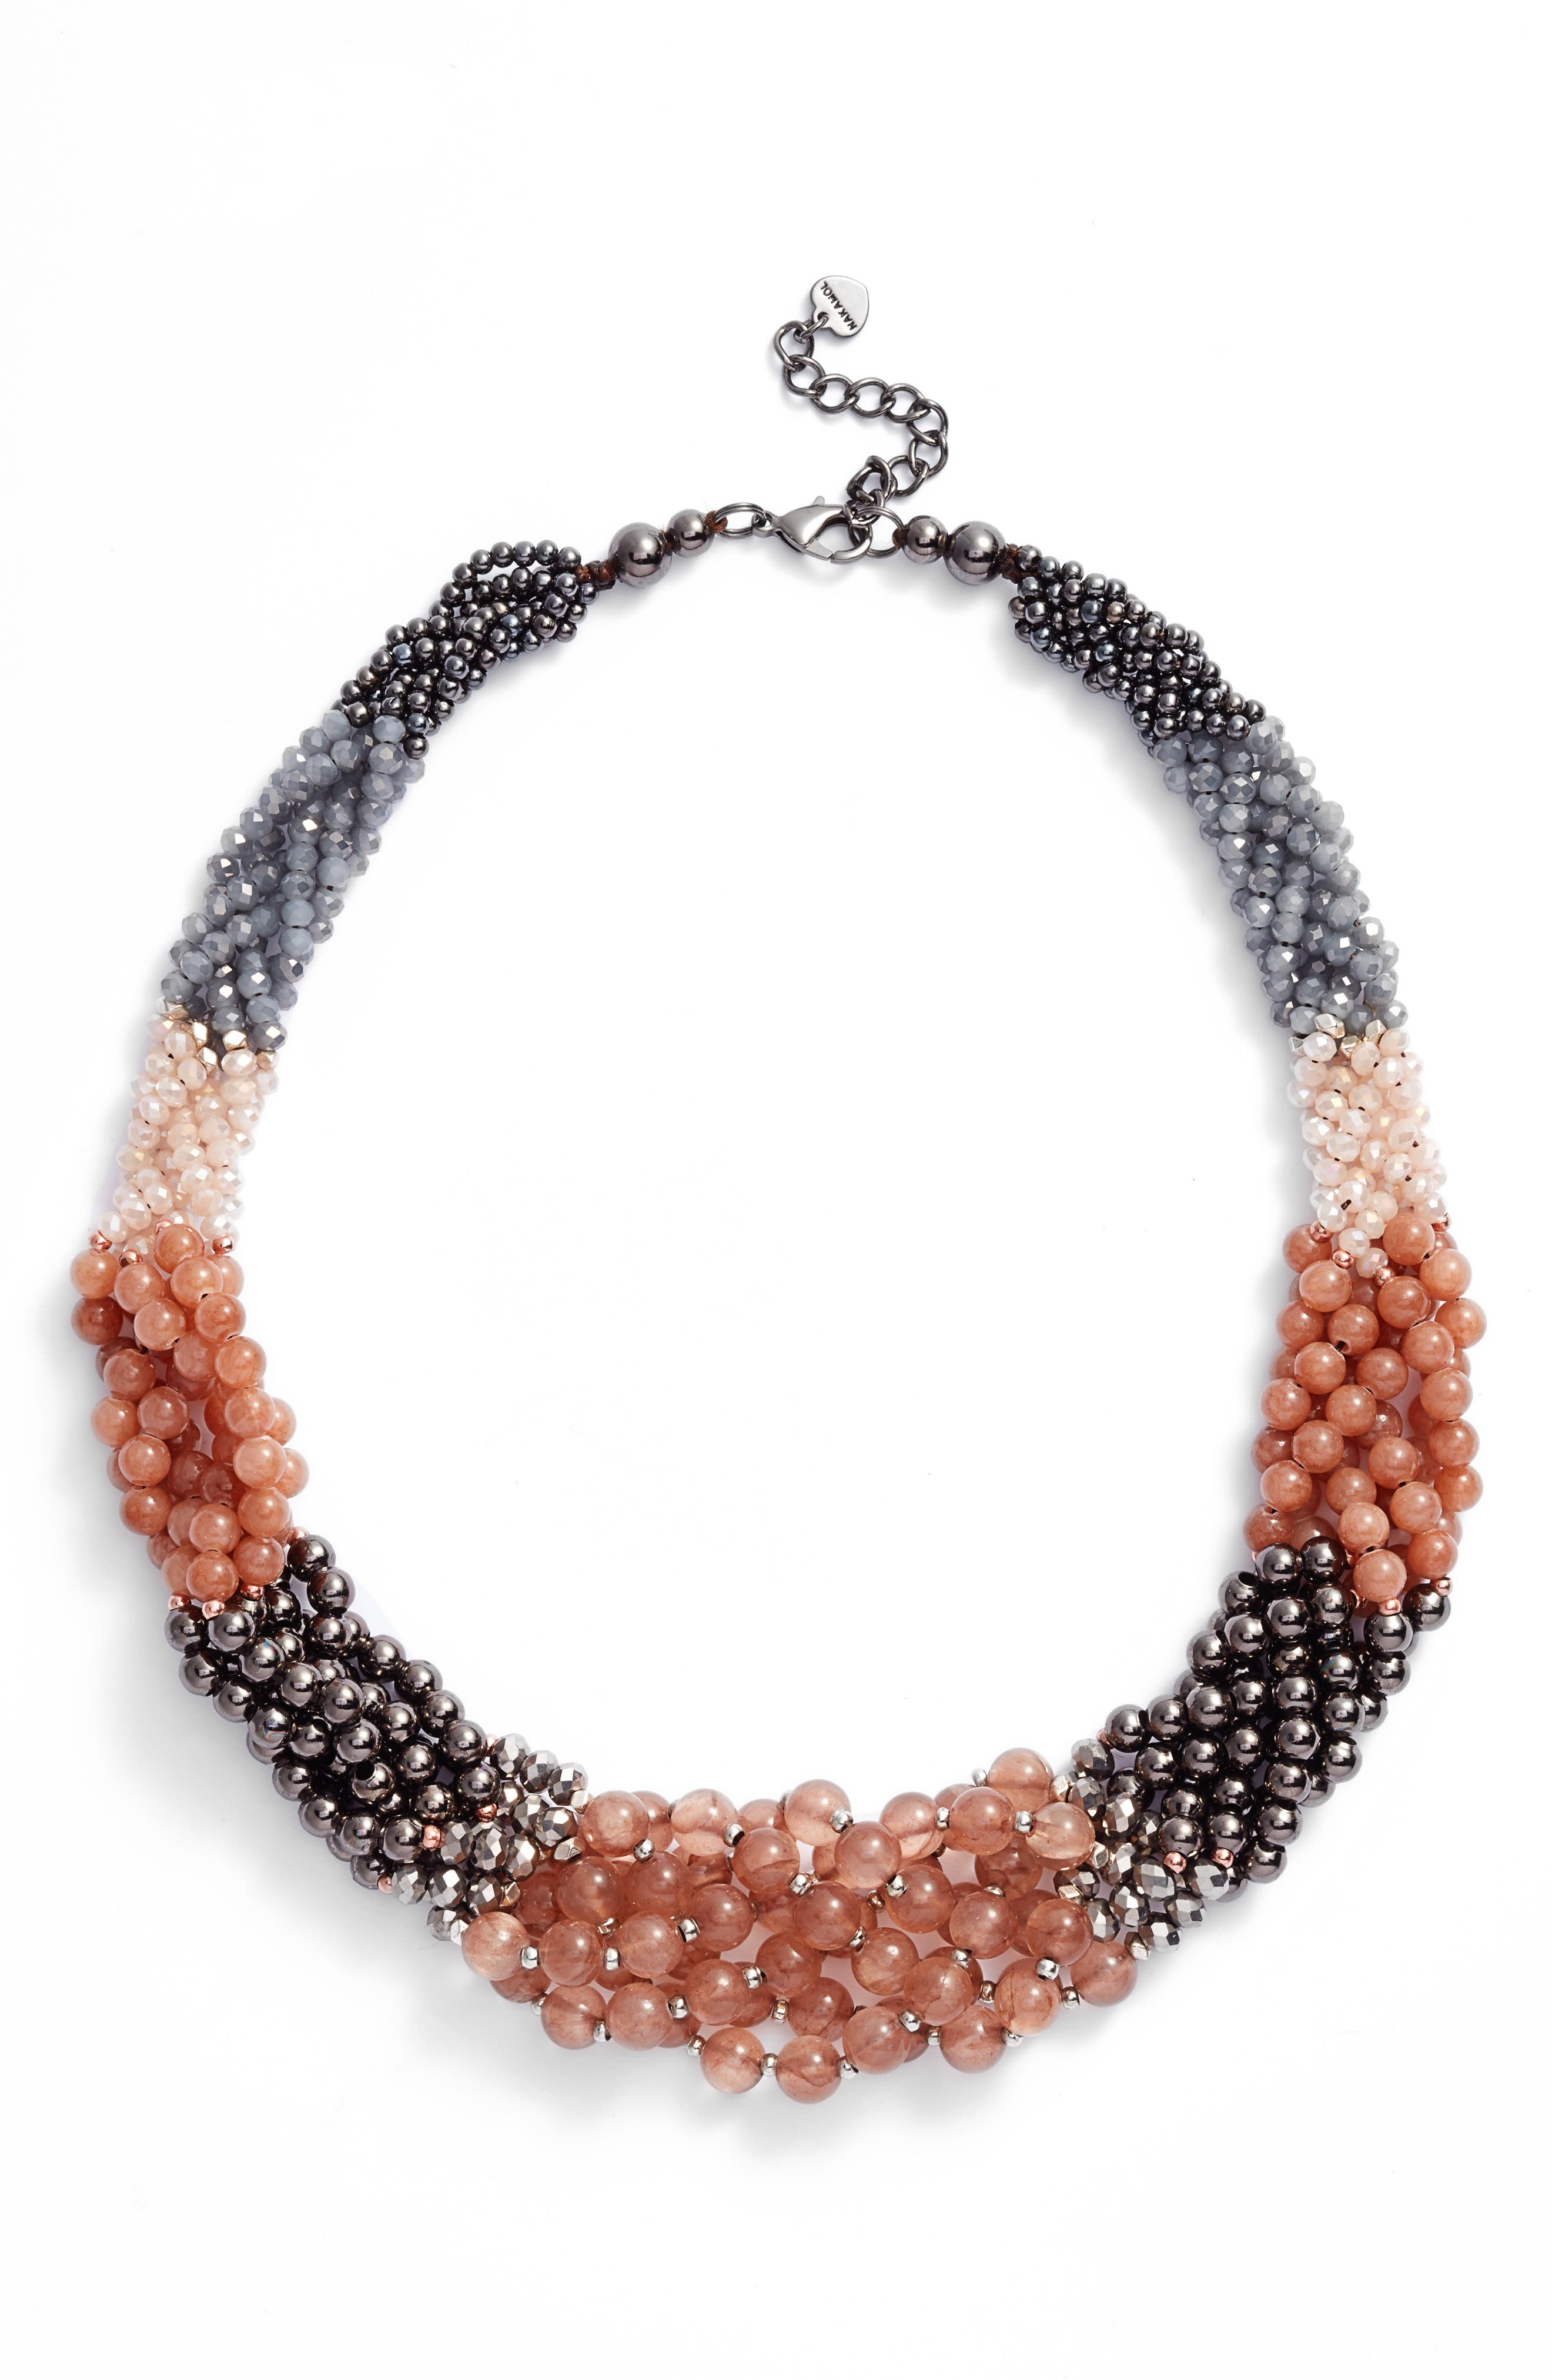 Main Image - Nakamol Design Braided Stone Statement Necklace